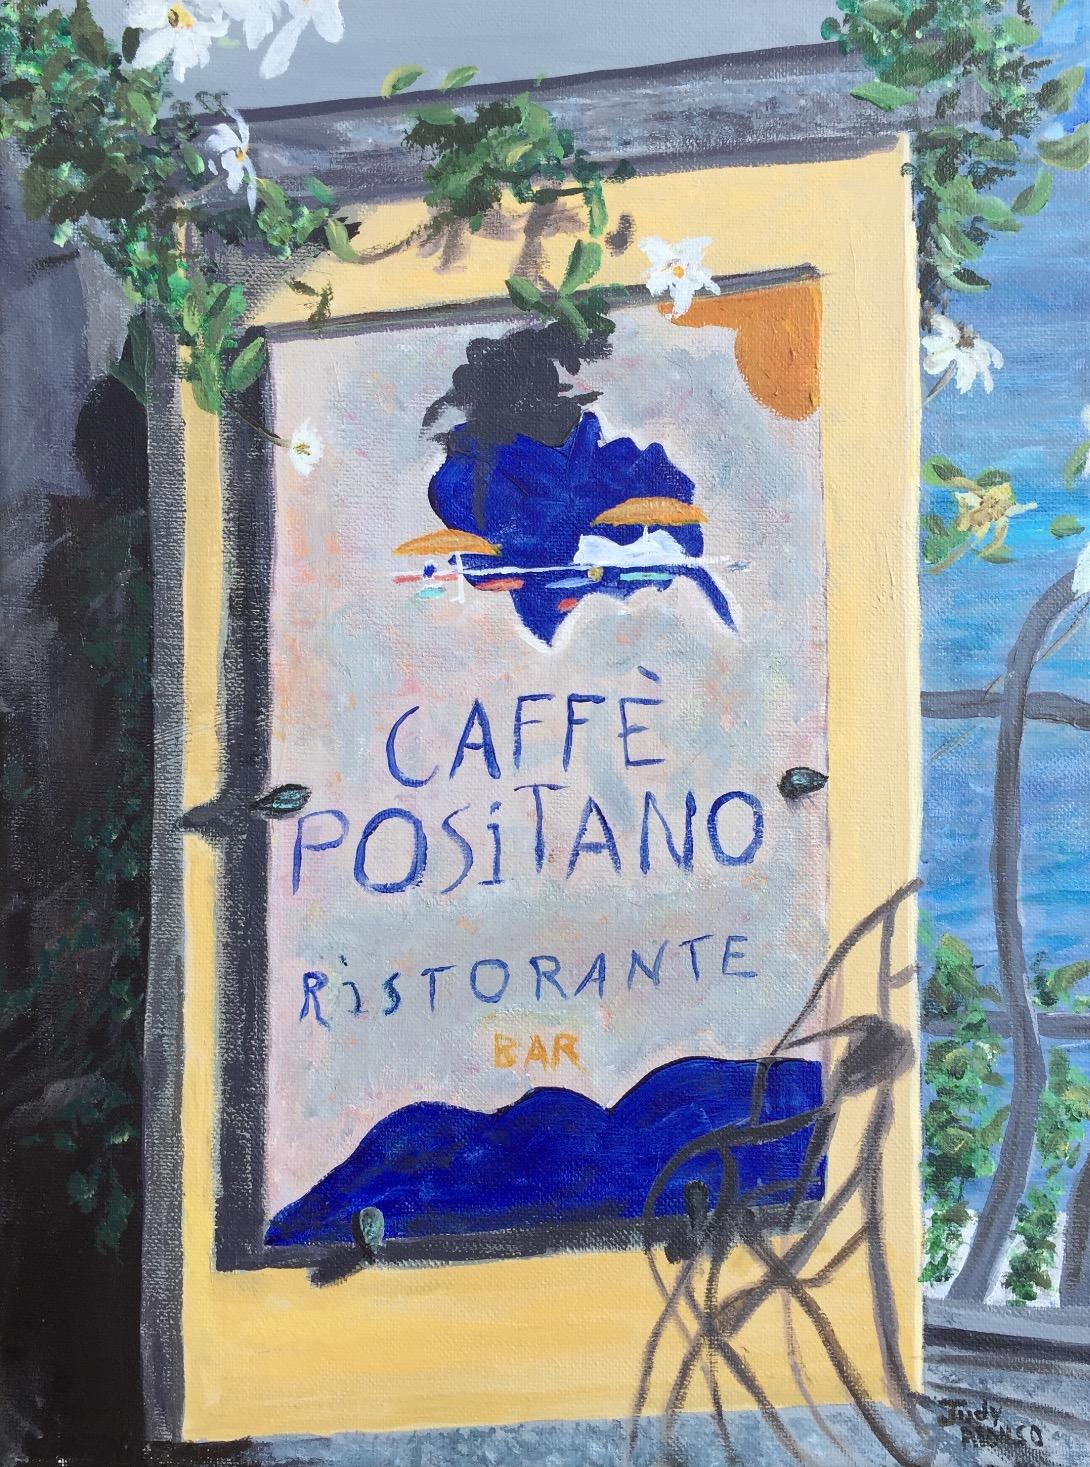 Cafe Positano